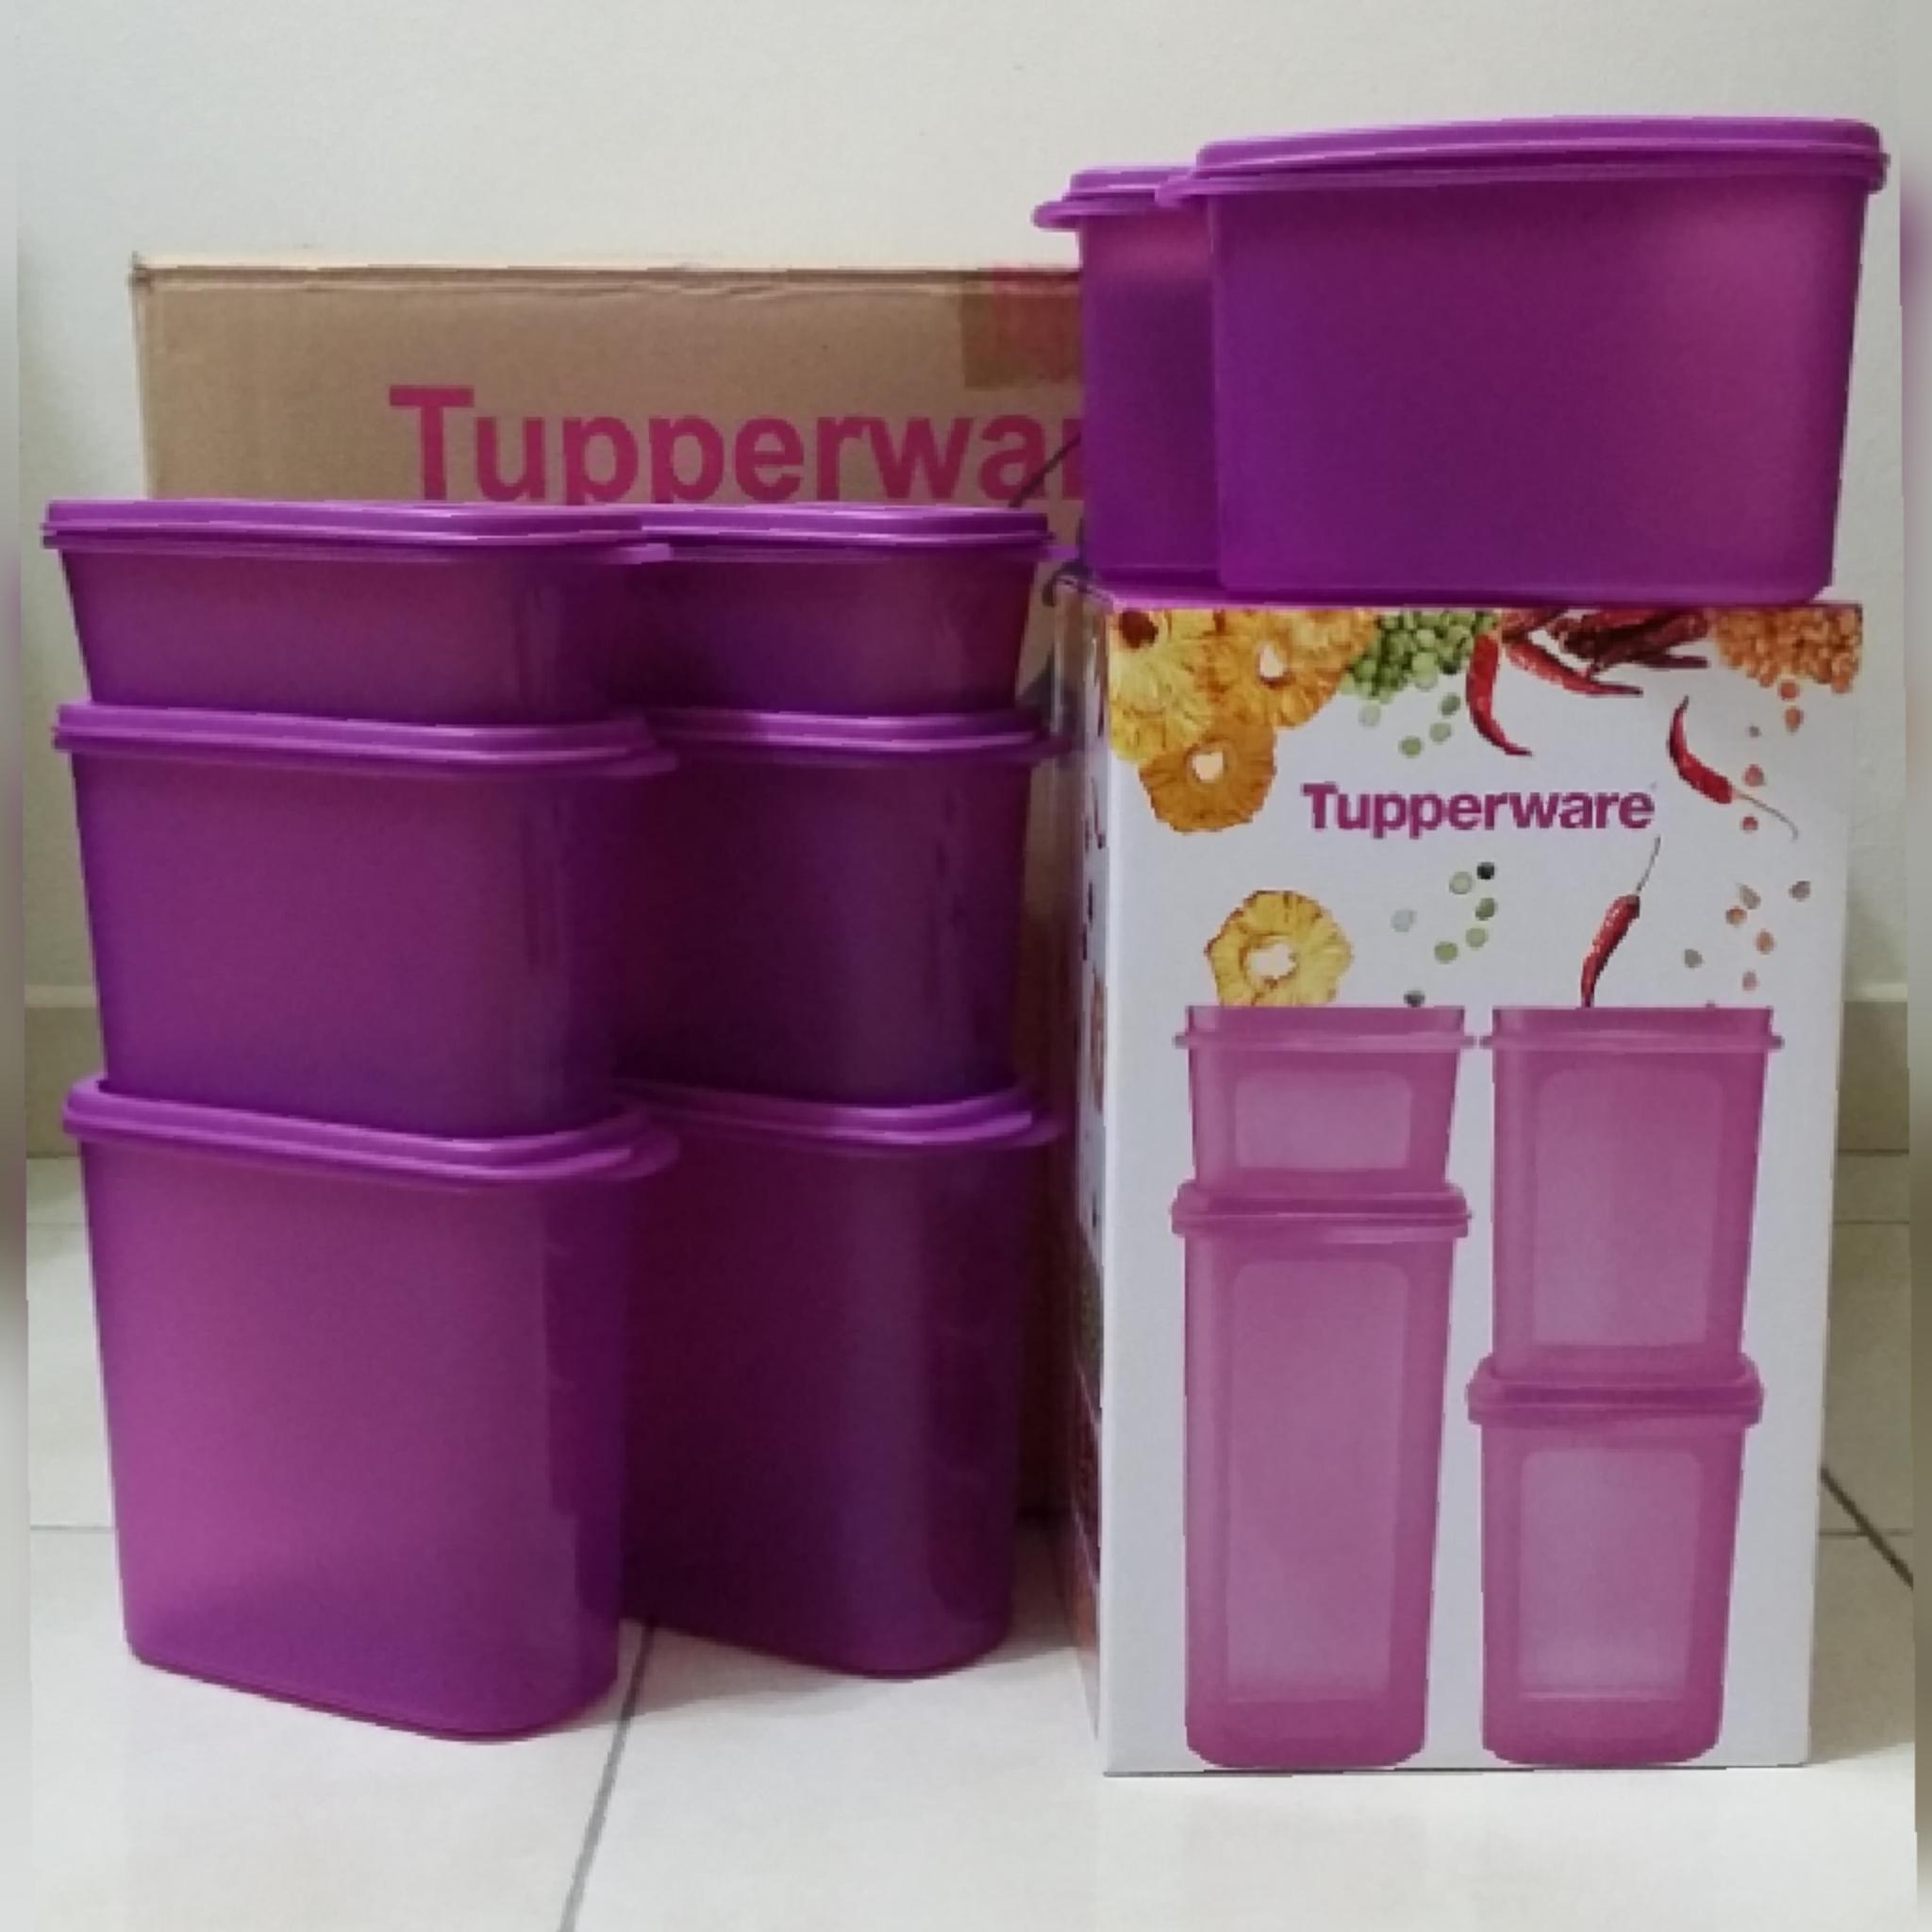 04cae57a9 Tupperware Smart Saver Oval Set